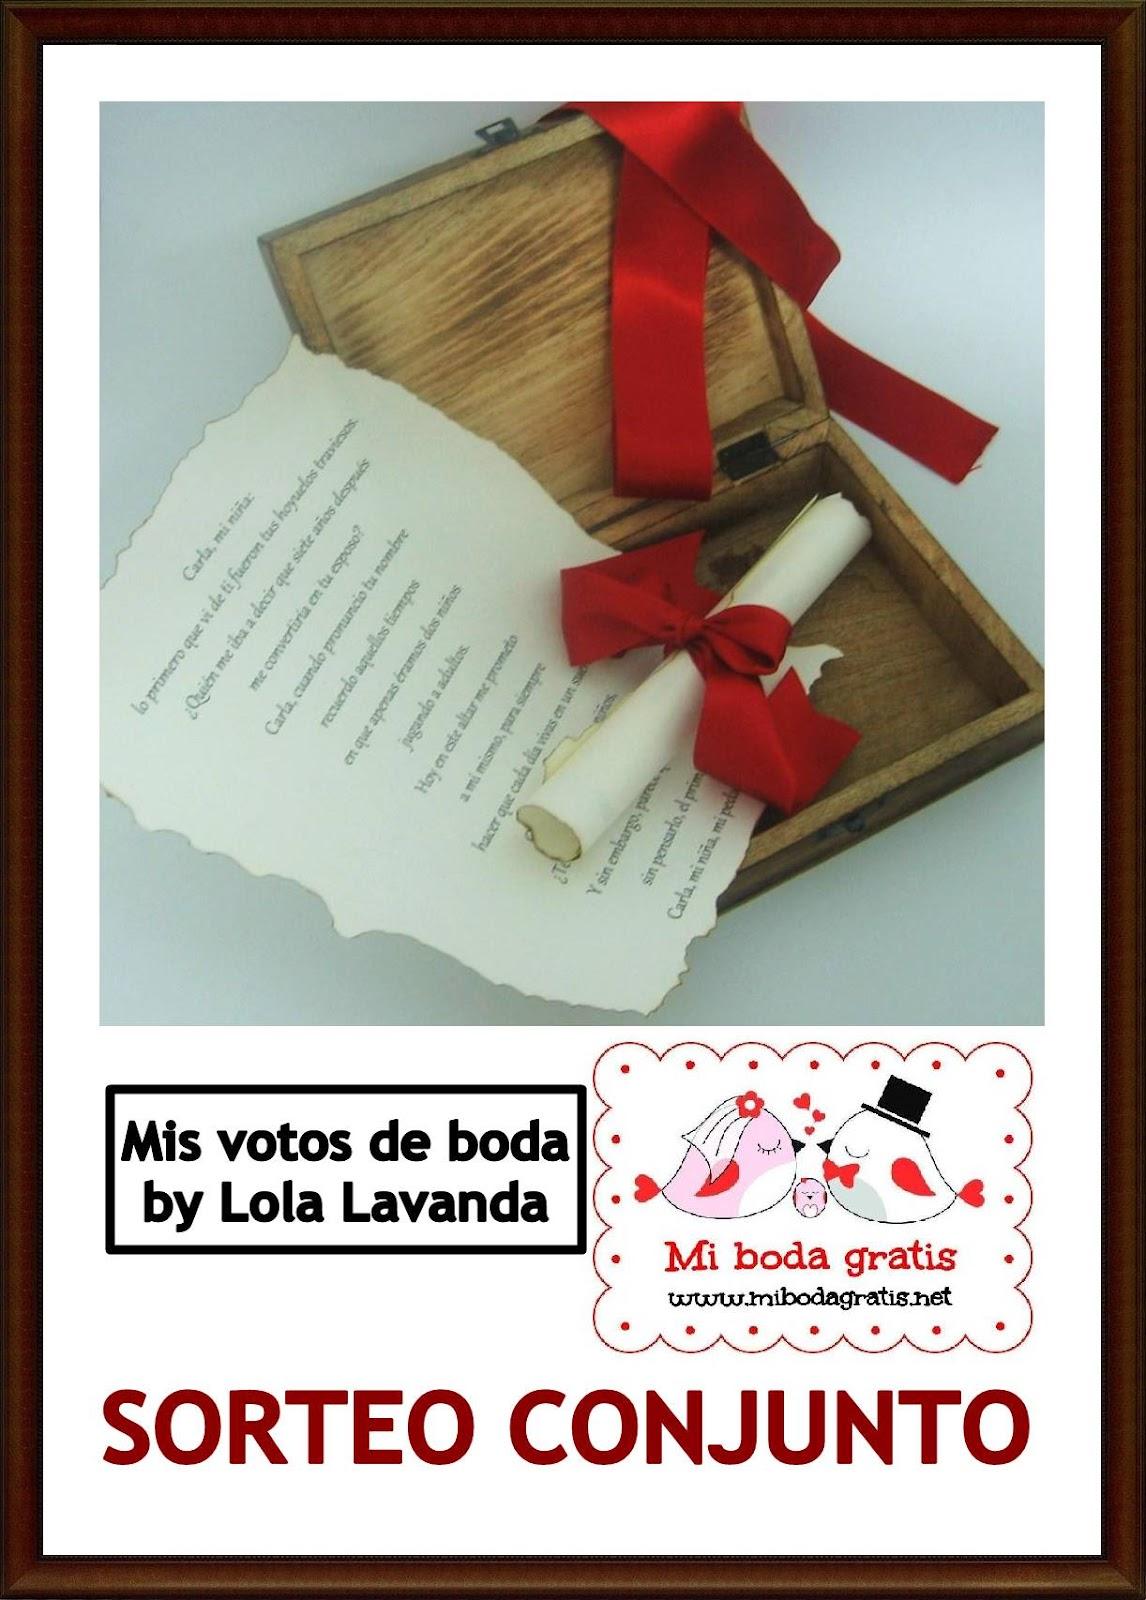 Blog Mi Boda: Mis Votos de Boda sortea Votos de Boda Personalizados